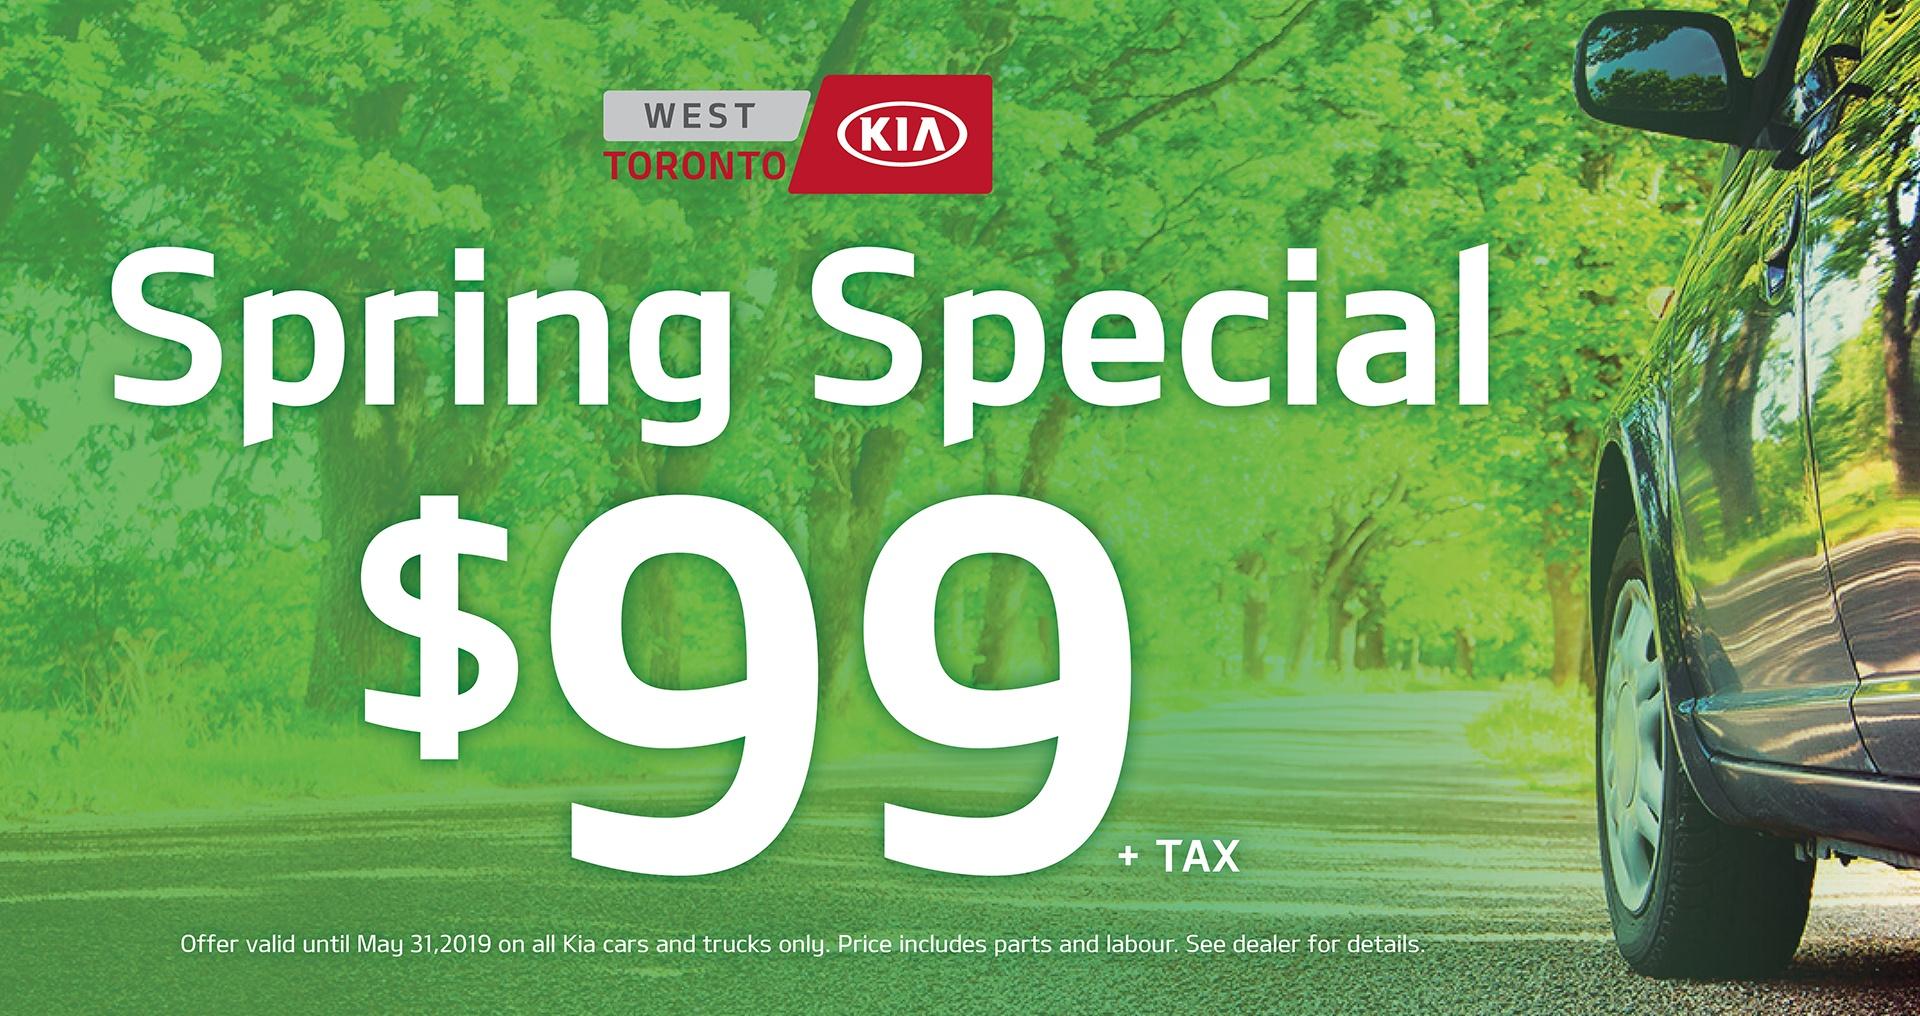 West Toronto Kia Spring Special